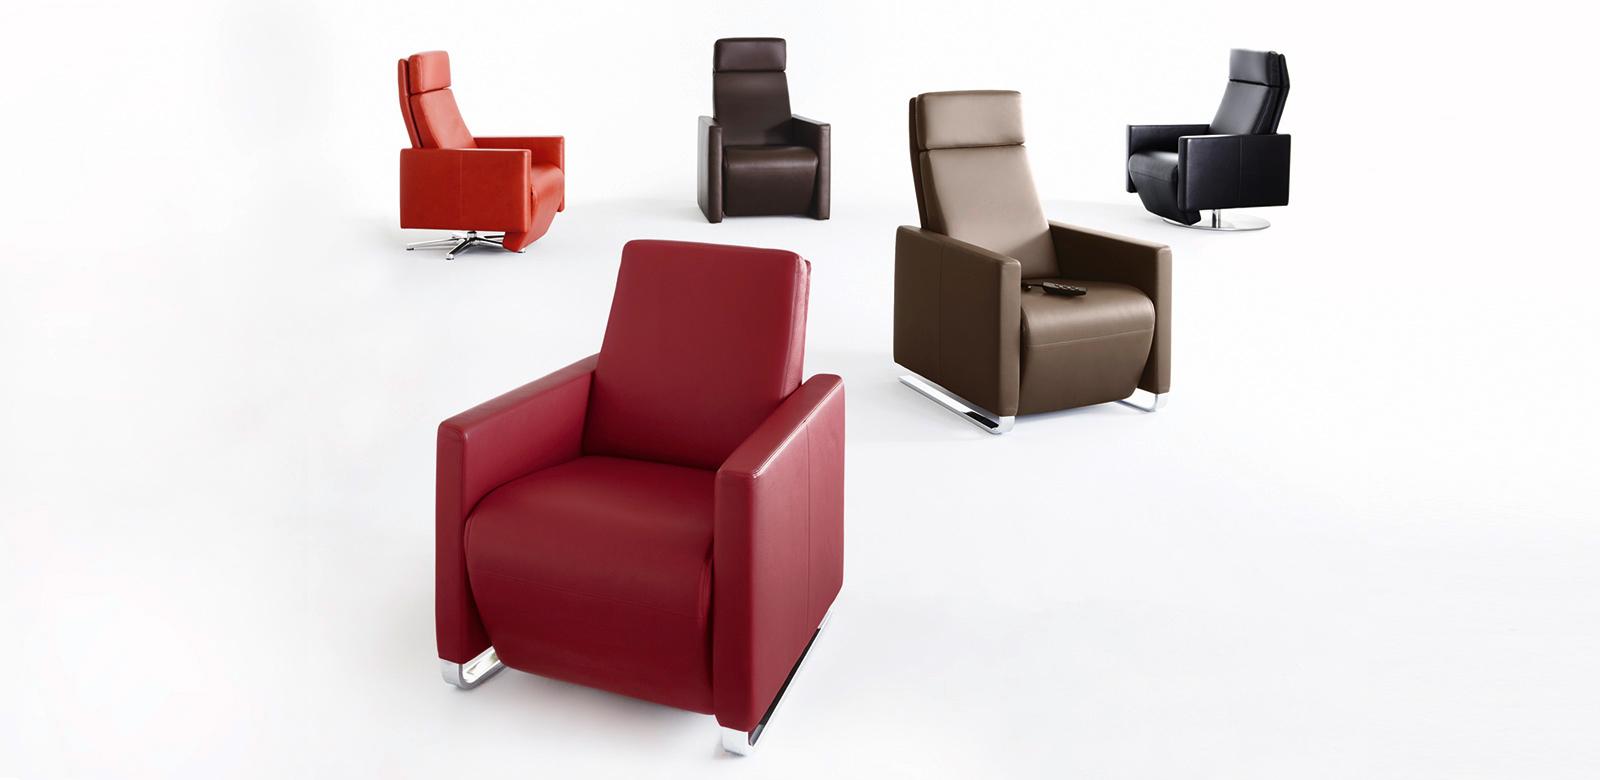 Designer Ledersessel erpo designer sessel ledersessel und drehsessel